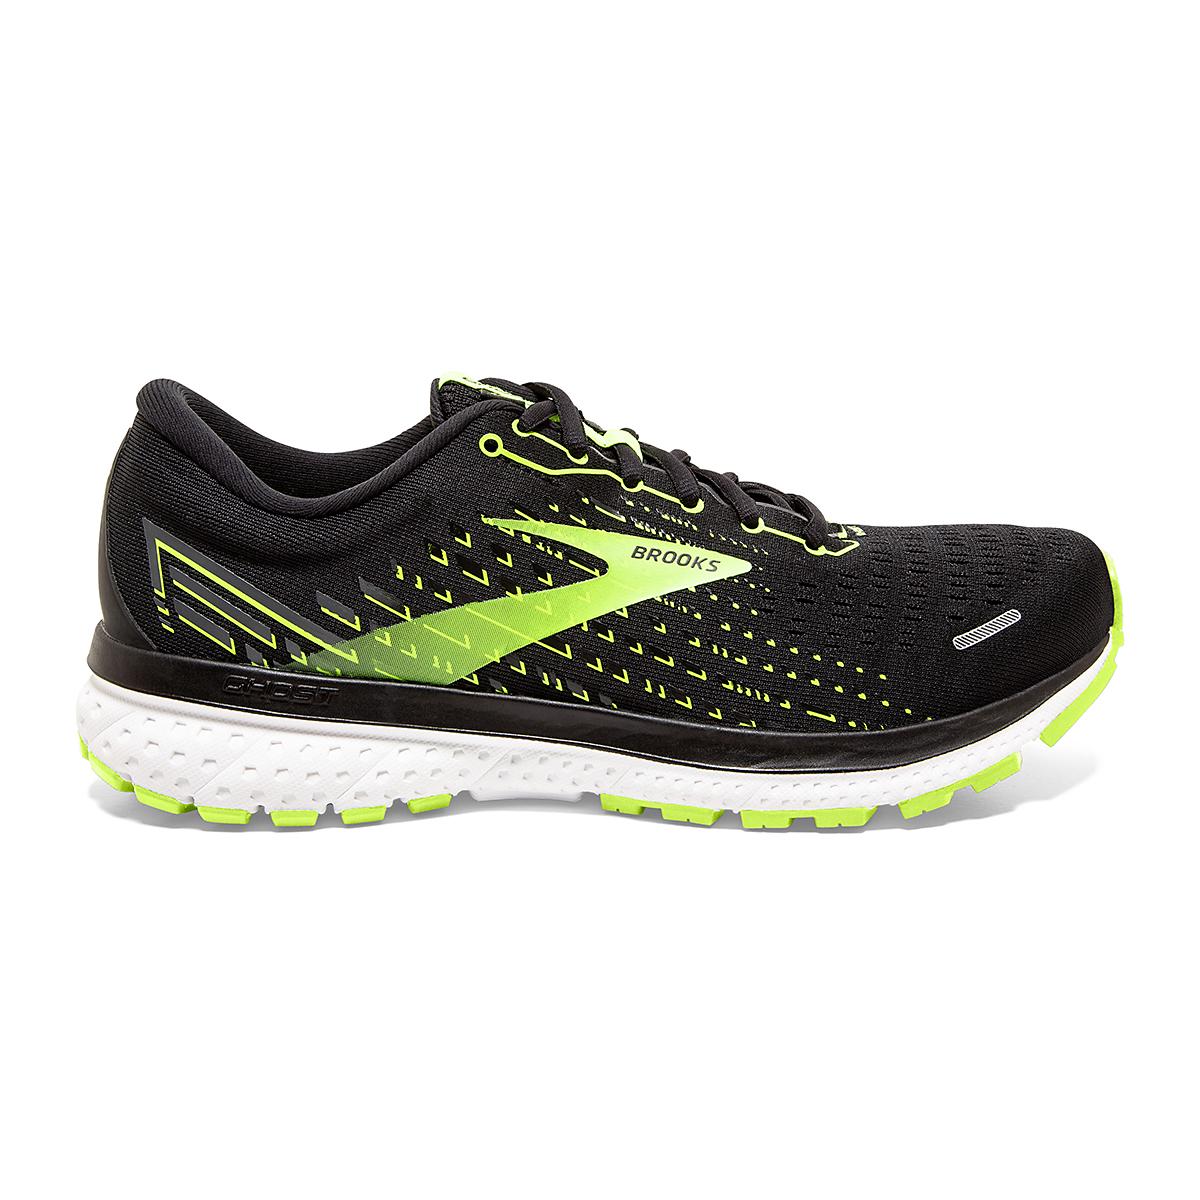 Men's Brooks Ghost 13 Running Shoe - Color: Black/Nightlife/White - Size: 7 - Width: Regular, Black/Nightlife/White, large, image 1